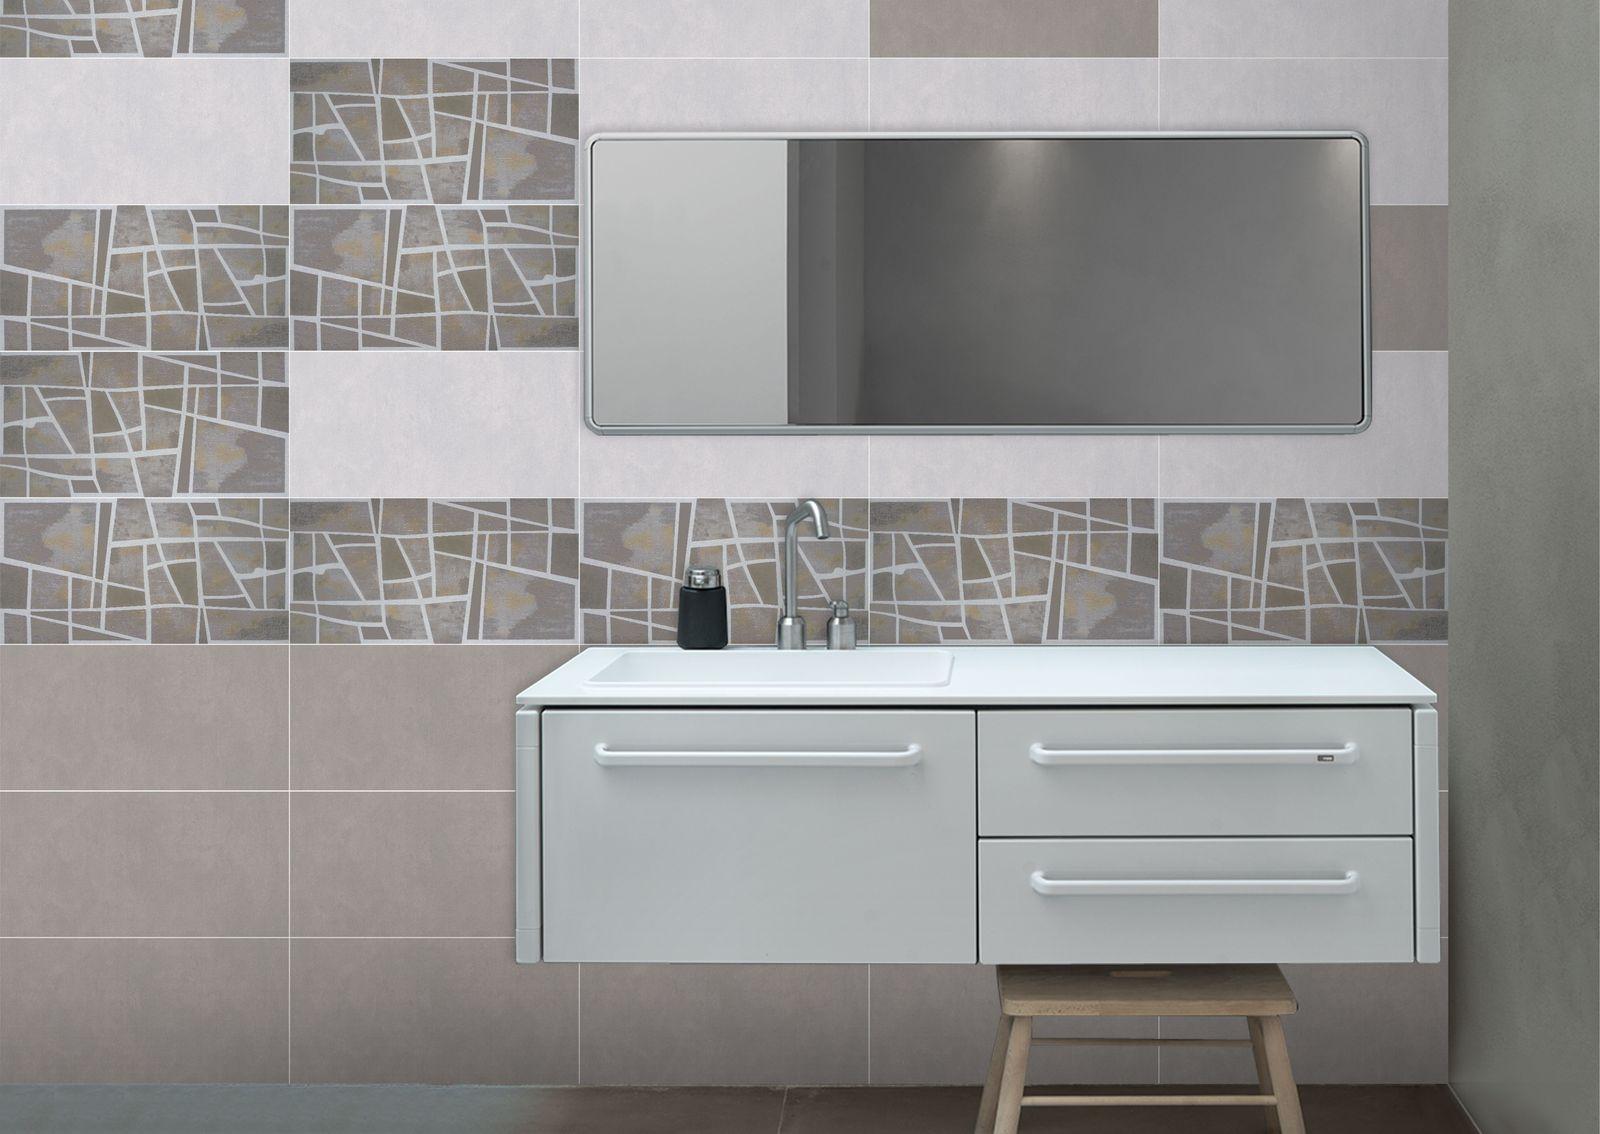 luxury el 1206 30x60 cm layout result